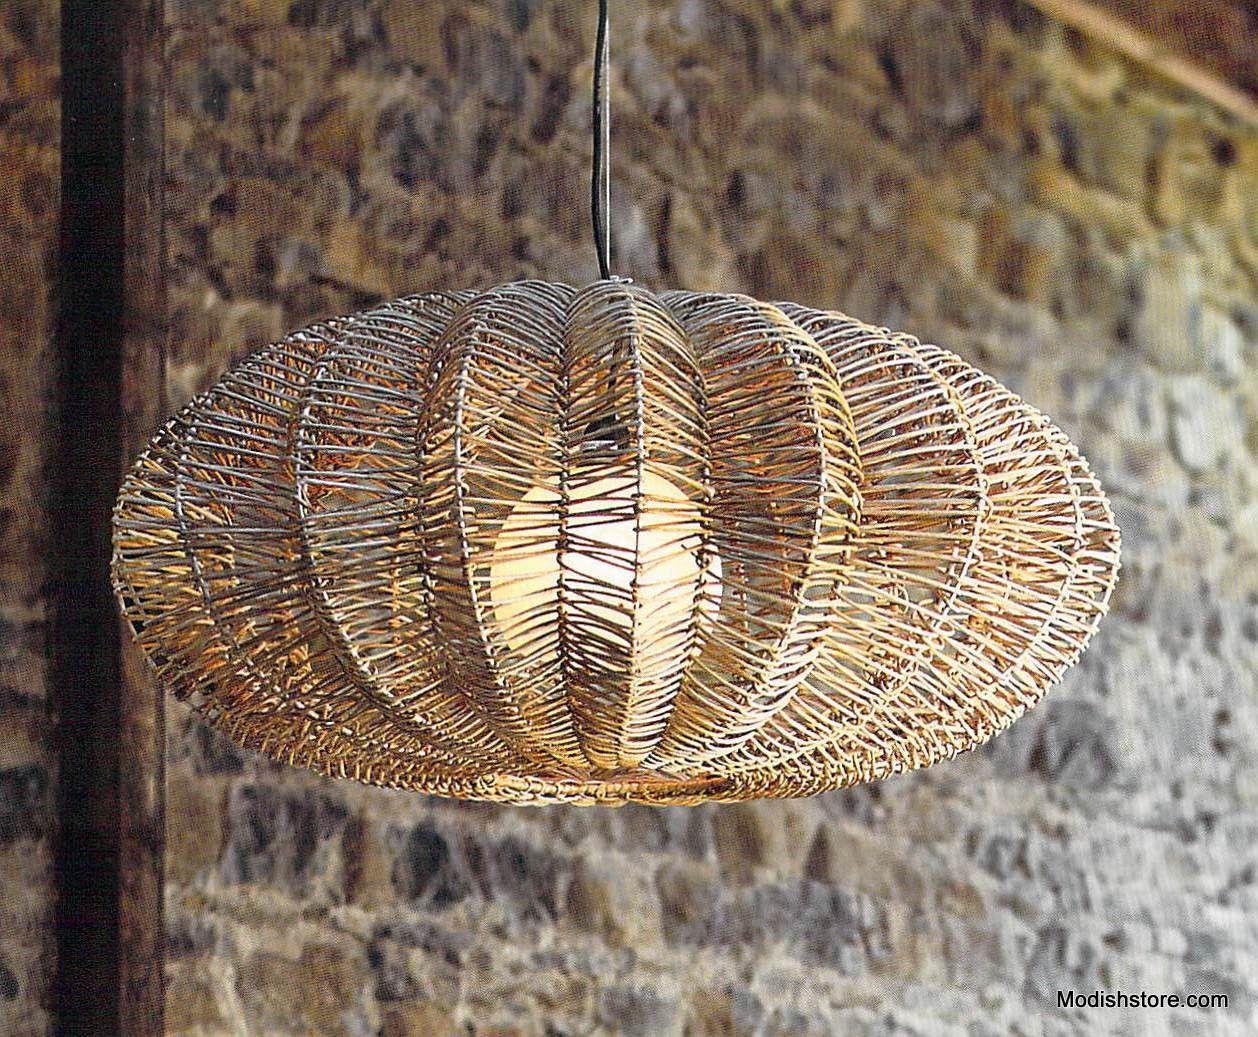 Roost Costa Verde Hanging Lamp   Large  Next Day Shipping  Modern LightingLighting  DesignHanging  Roost Costa Verde Hanging Lamp   Large  Next Day Shipping  . Roost Lighting Design. Home Design Ideas